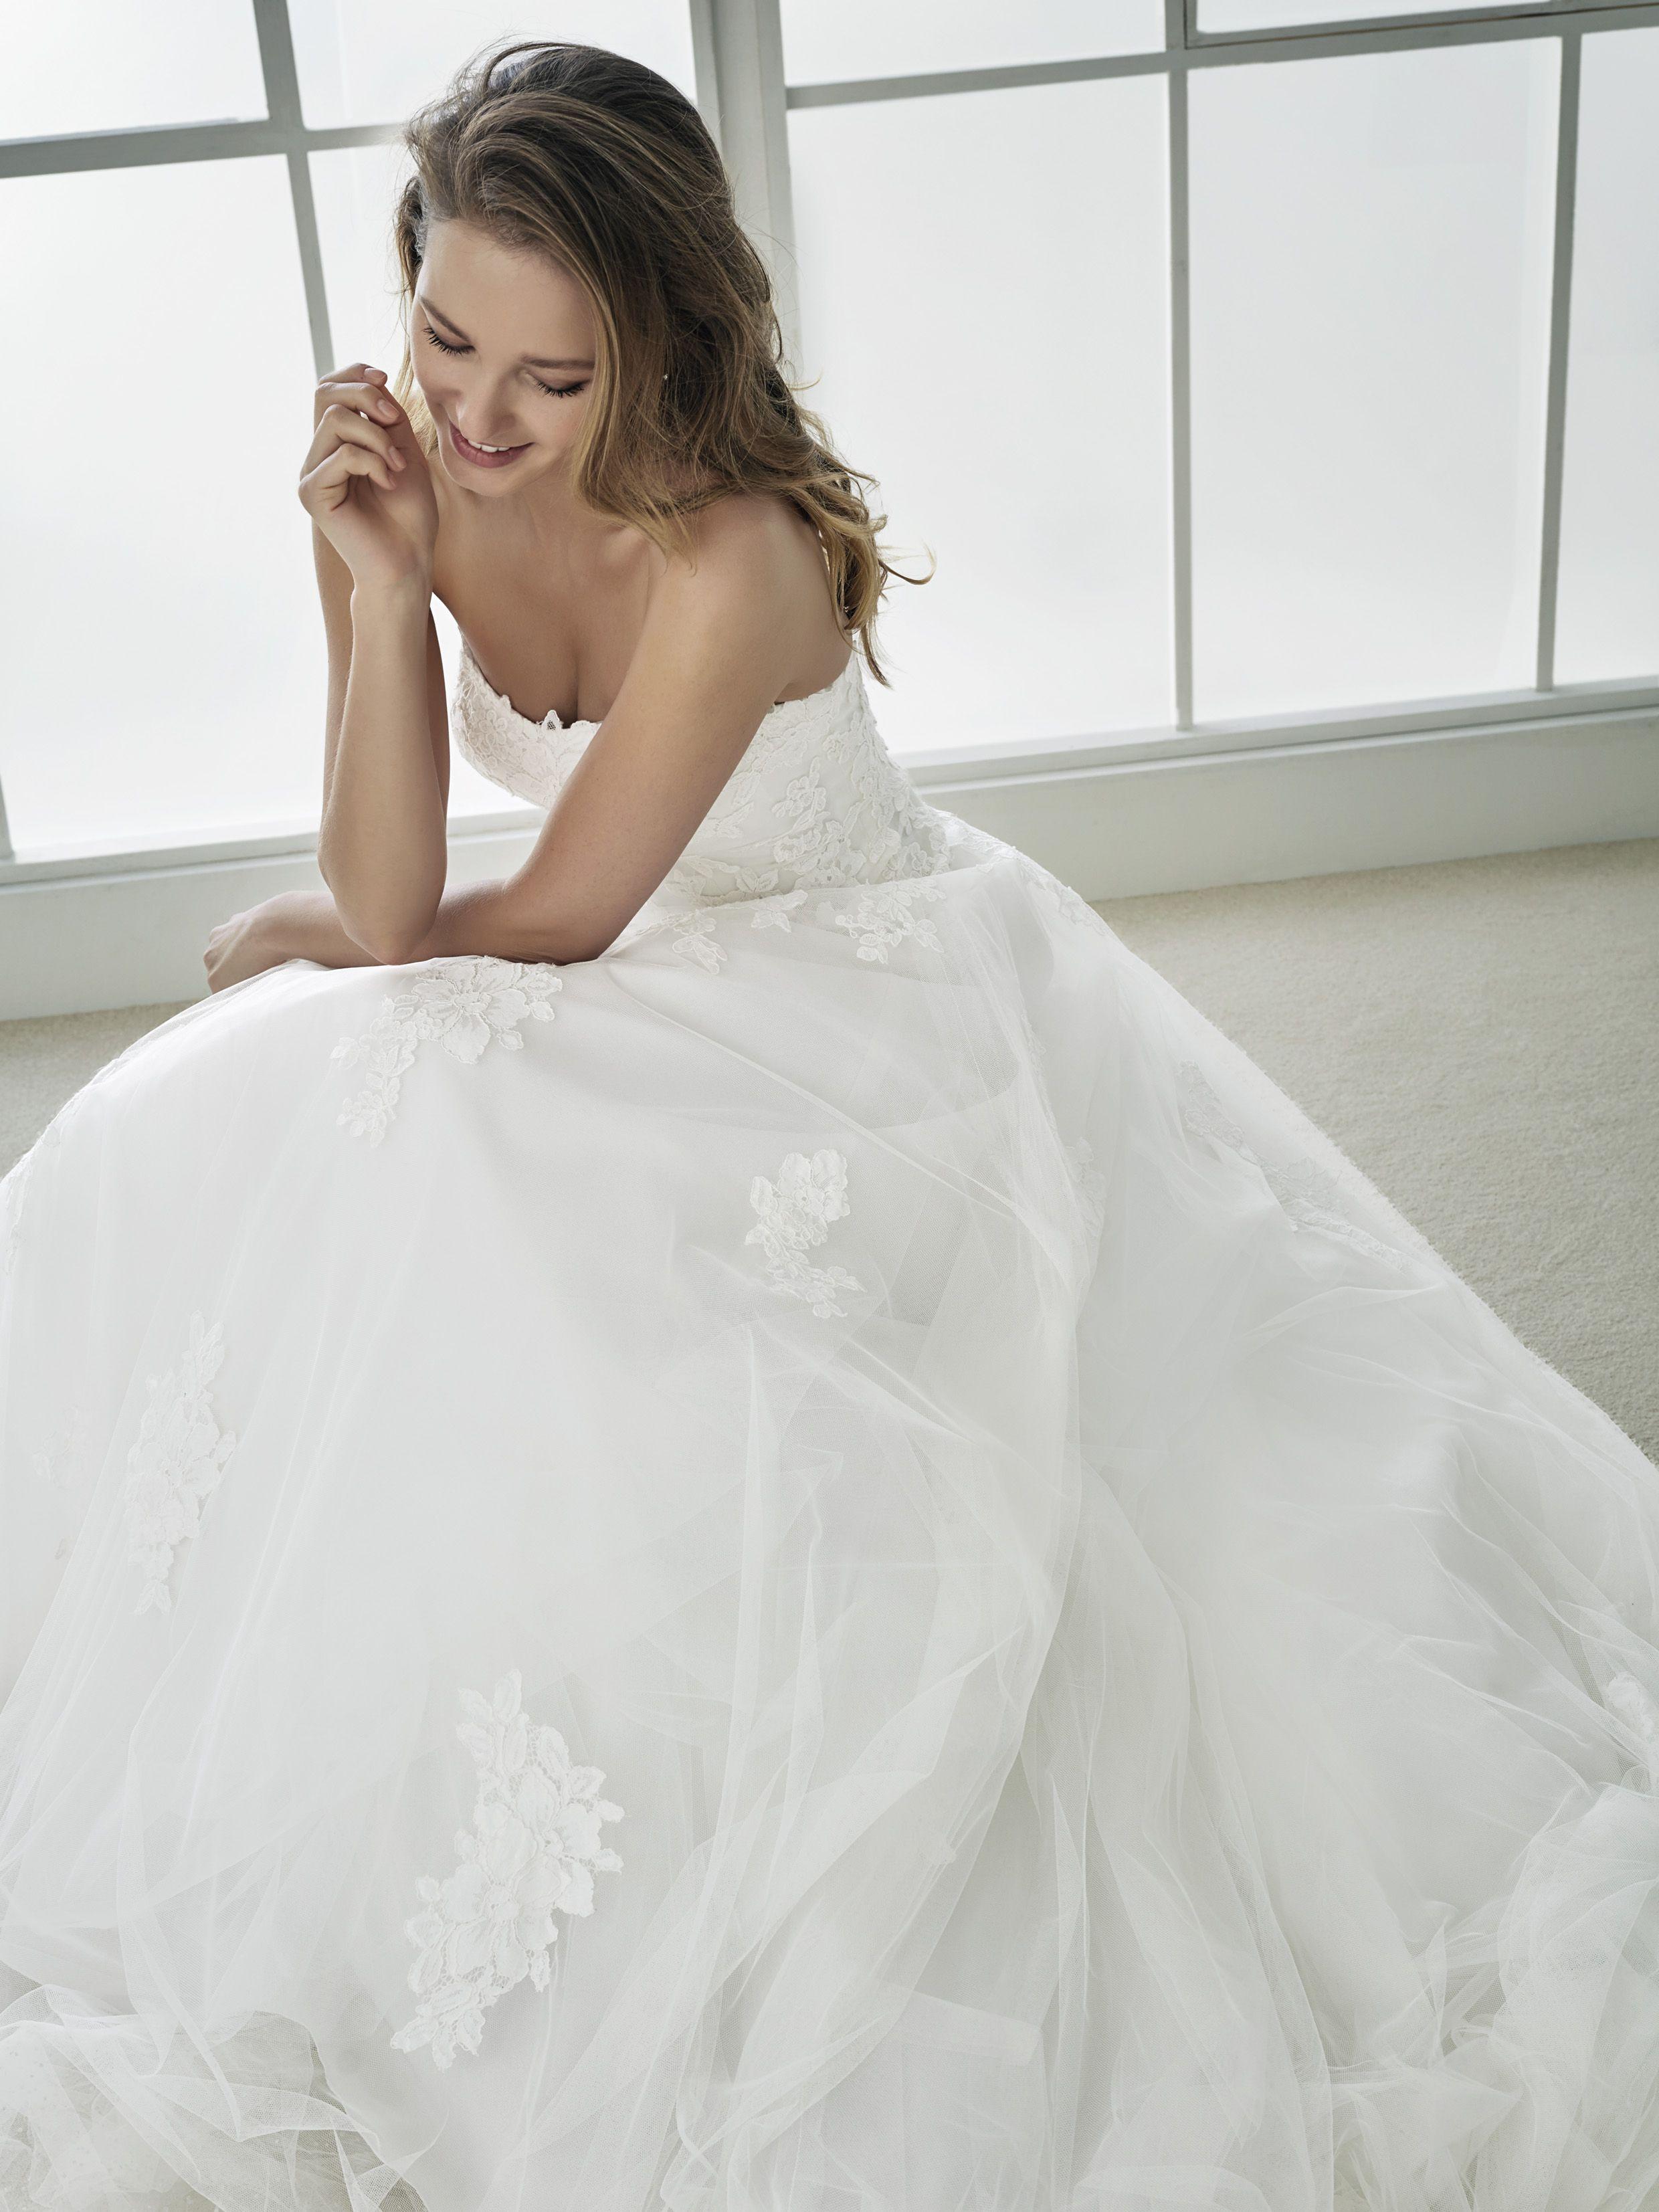 White one | Pronovias wedding dresses, Wedding dress and Weddings